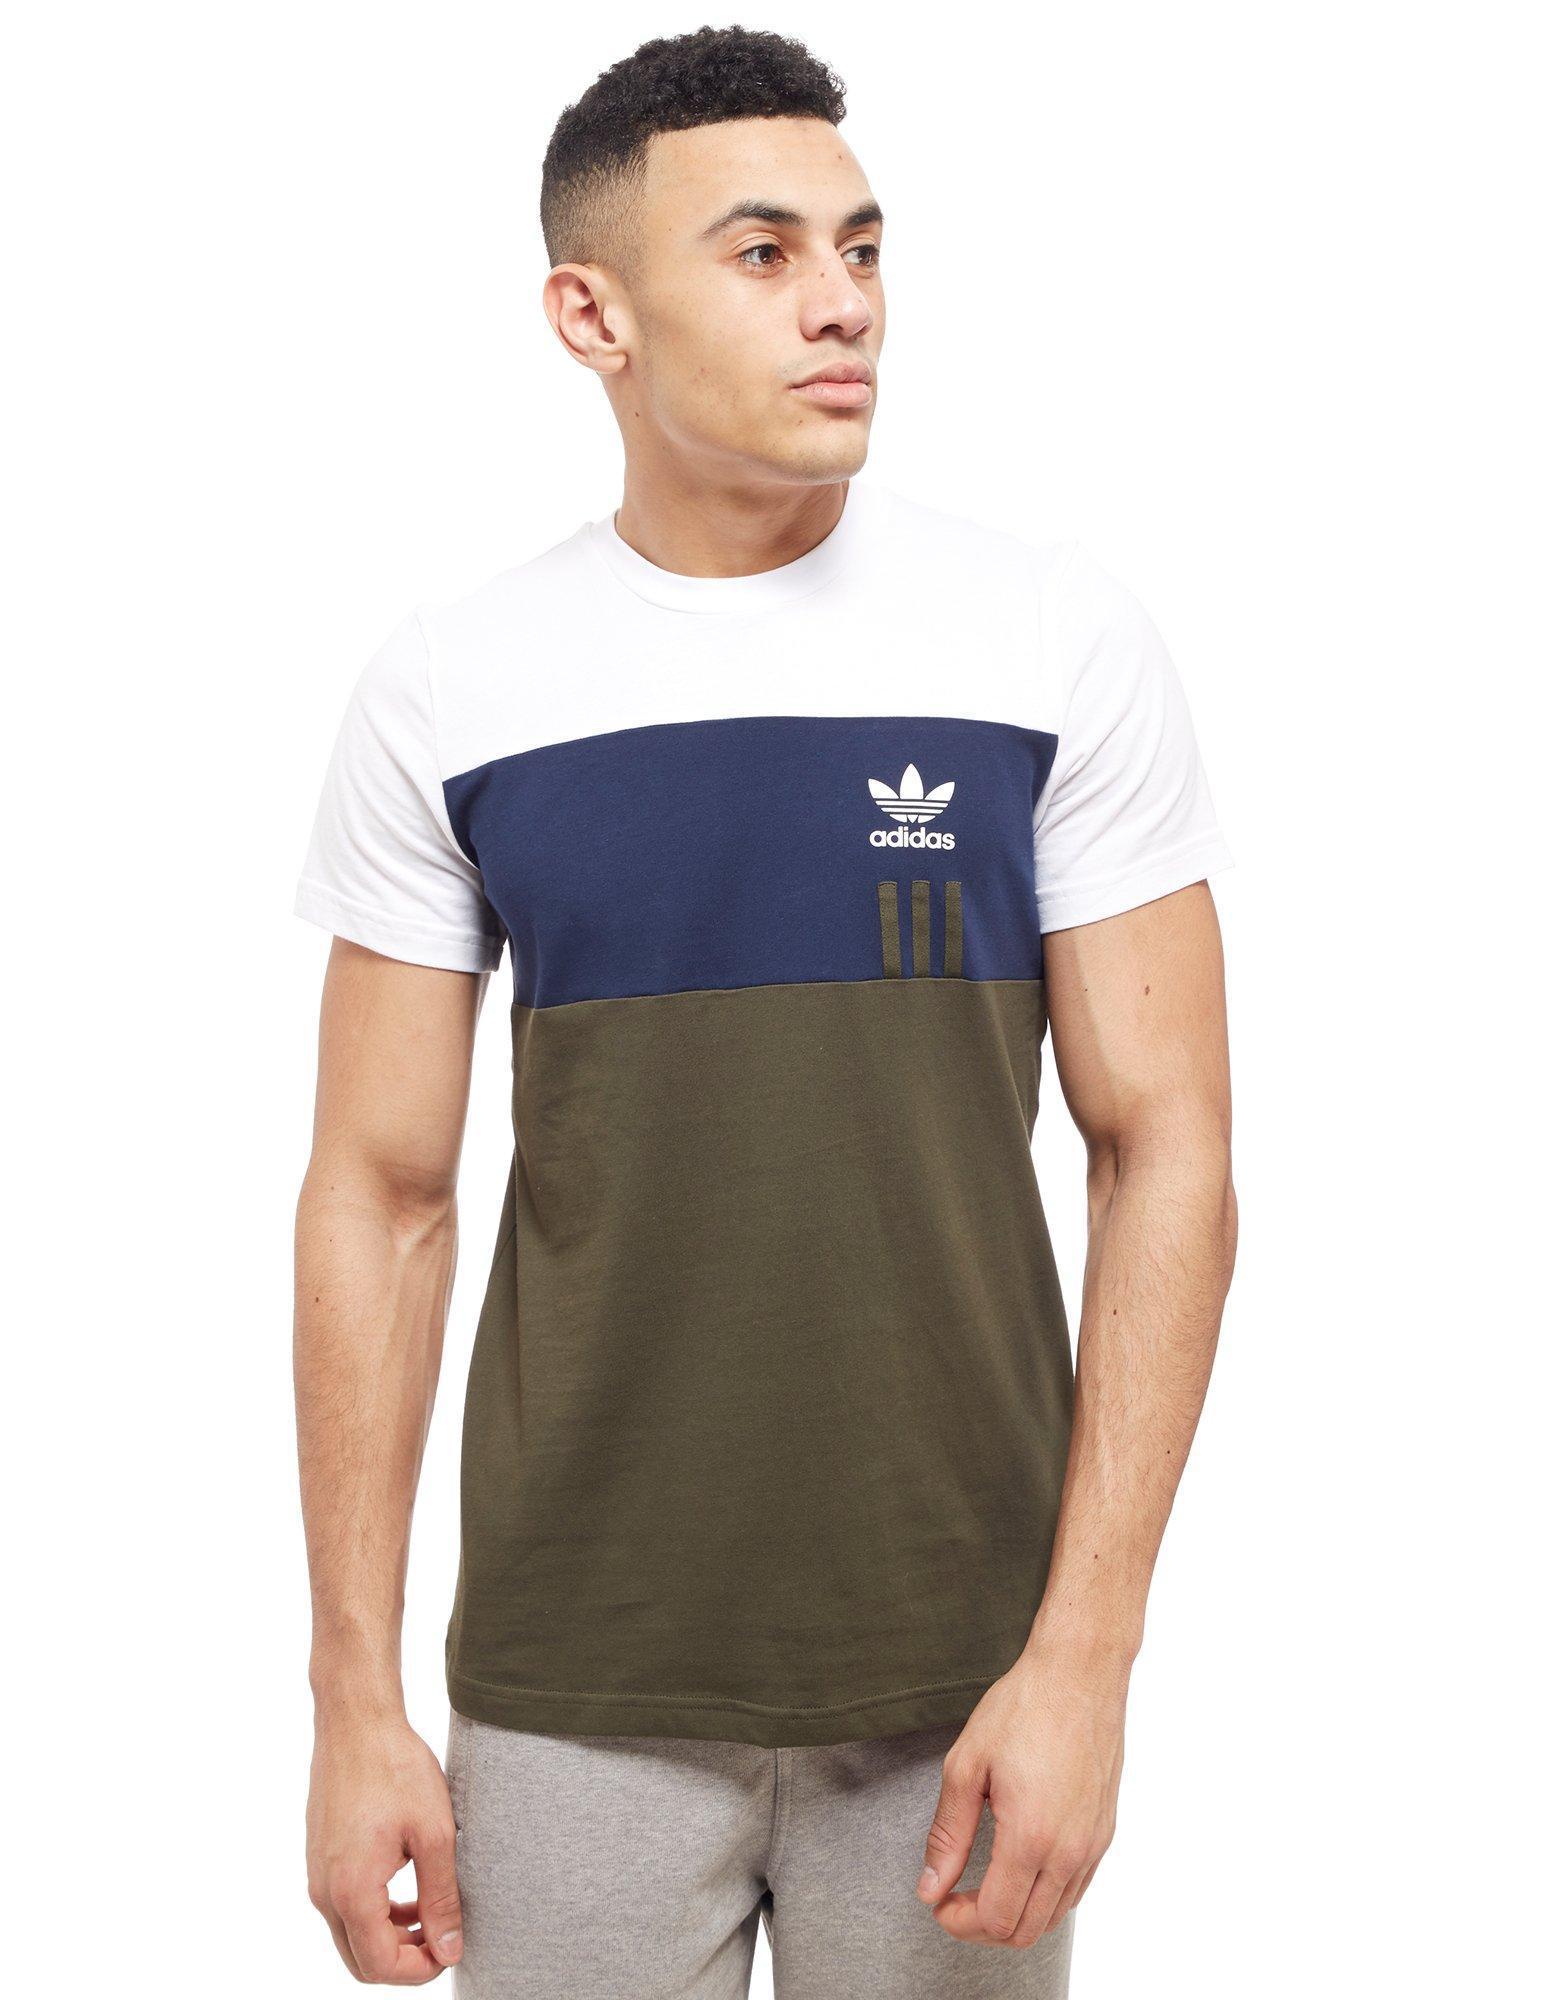 adidas originals t shirt khaki